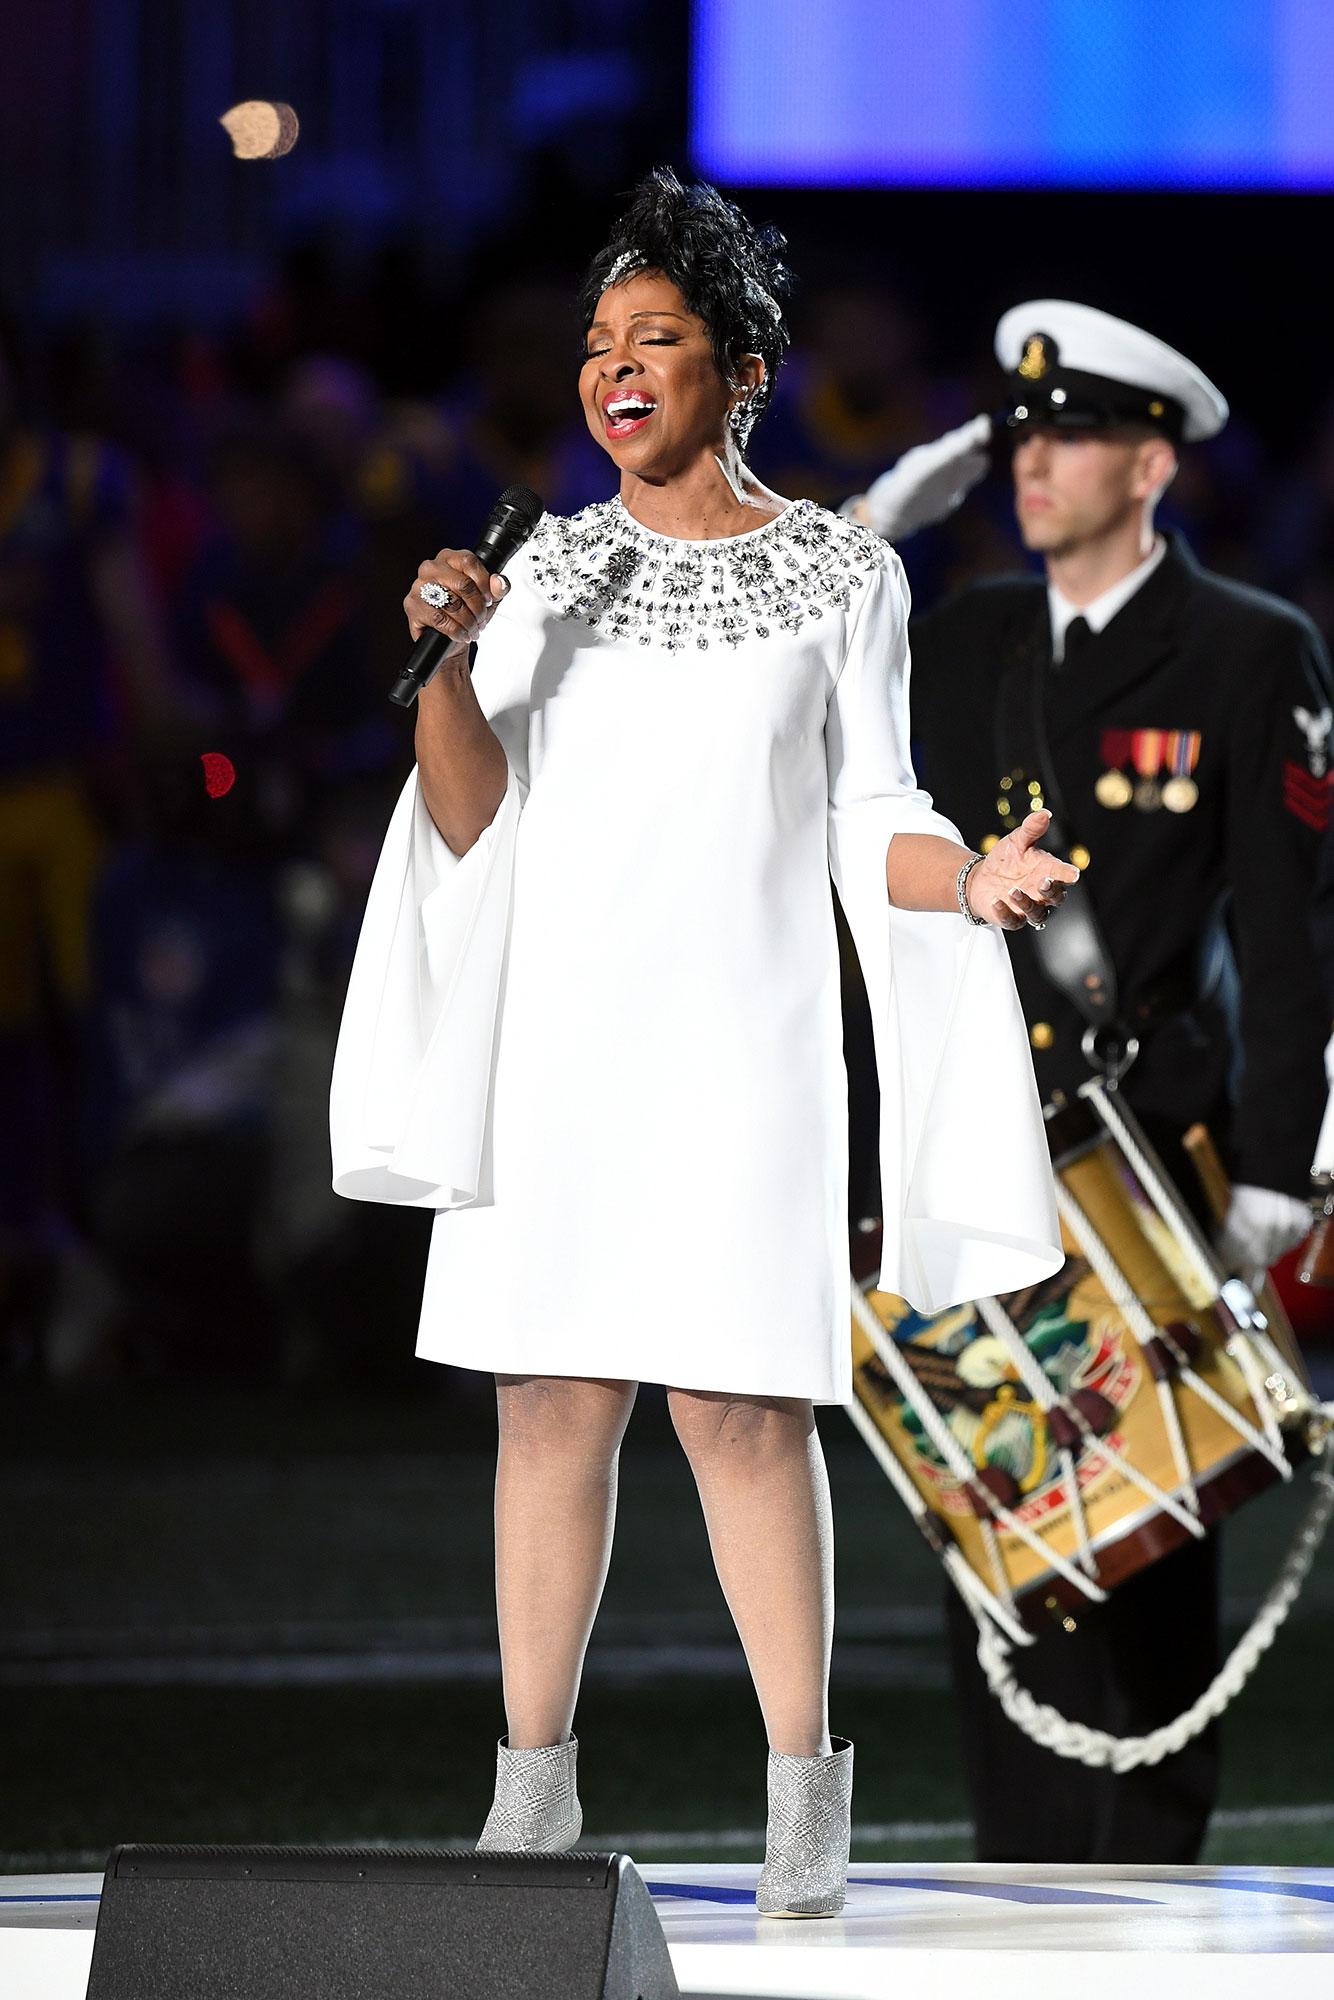 Gladys Knight Kicks Off Super Bowl LIII With National Anthem: Watch